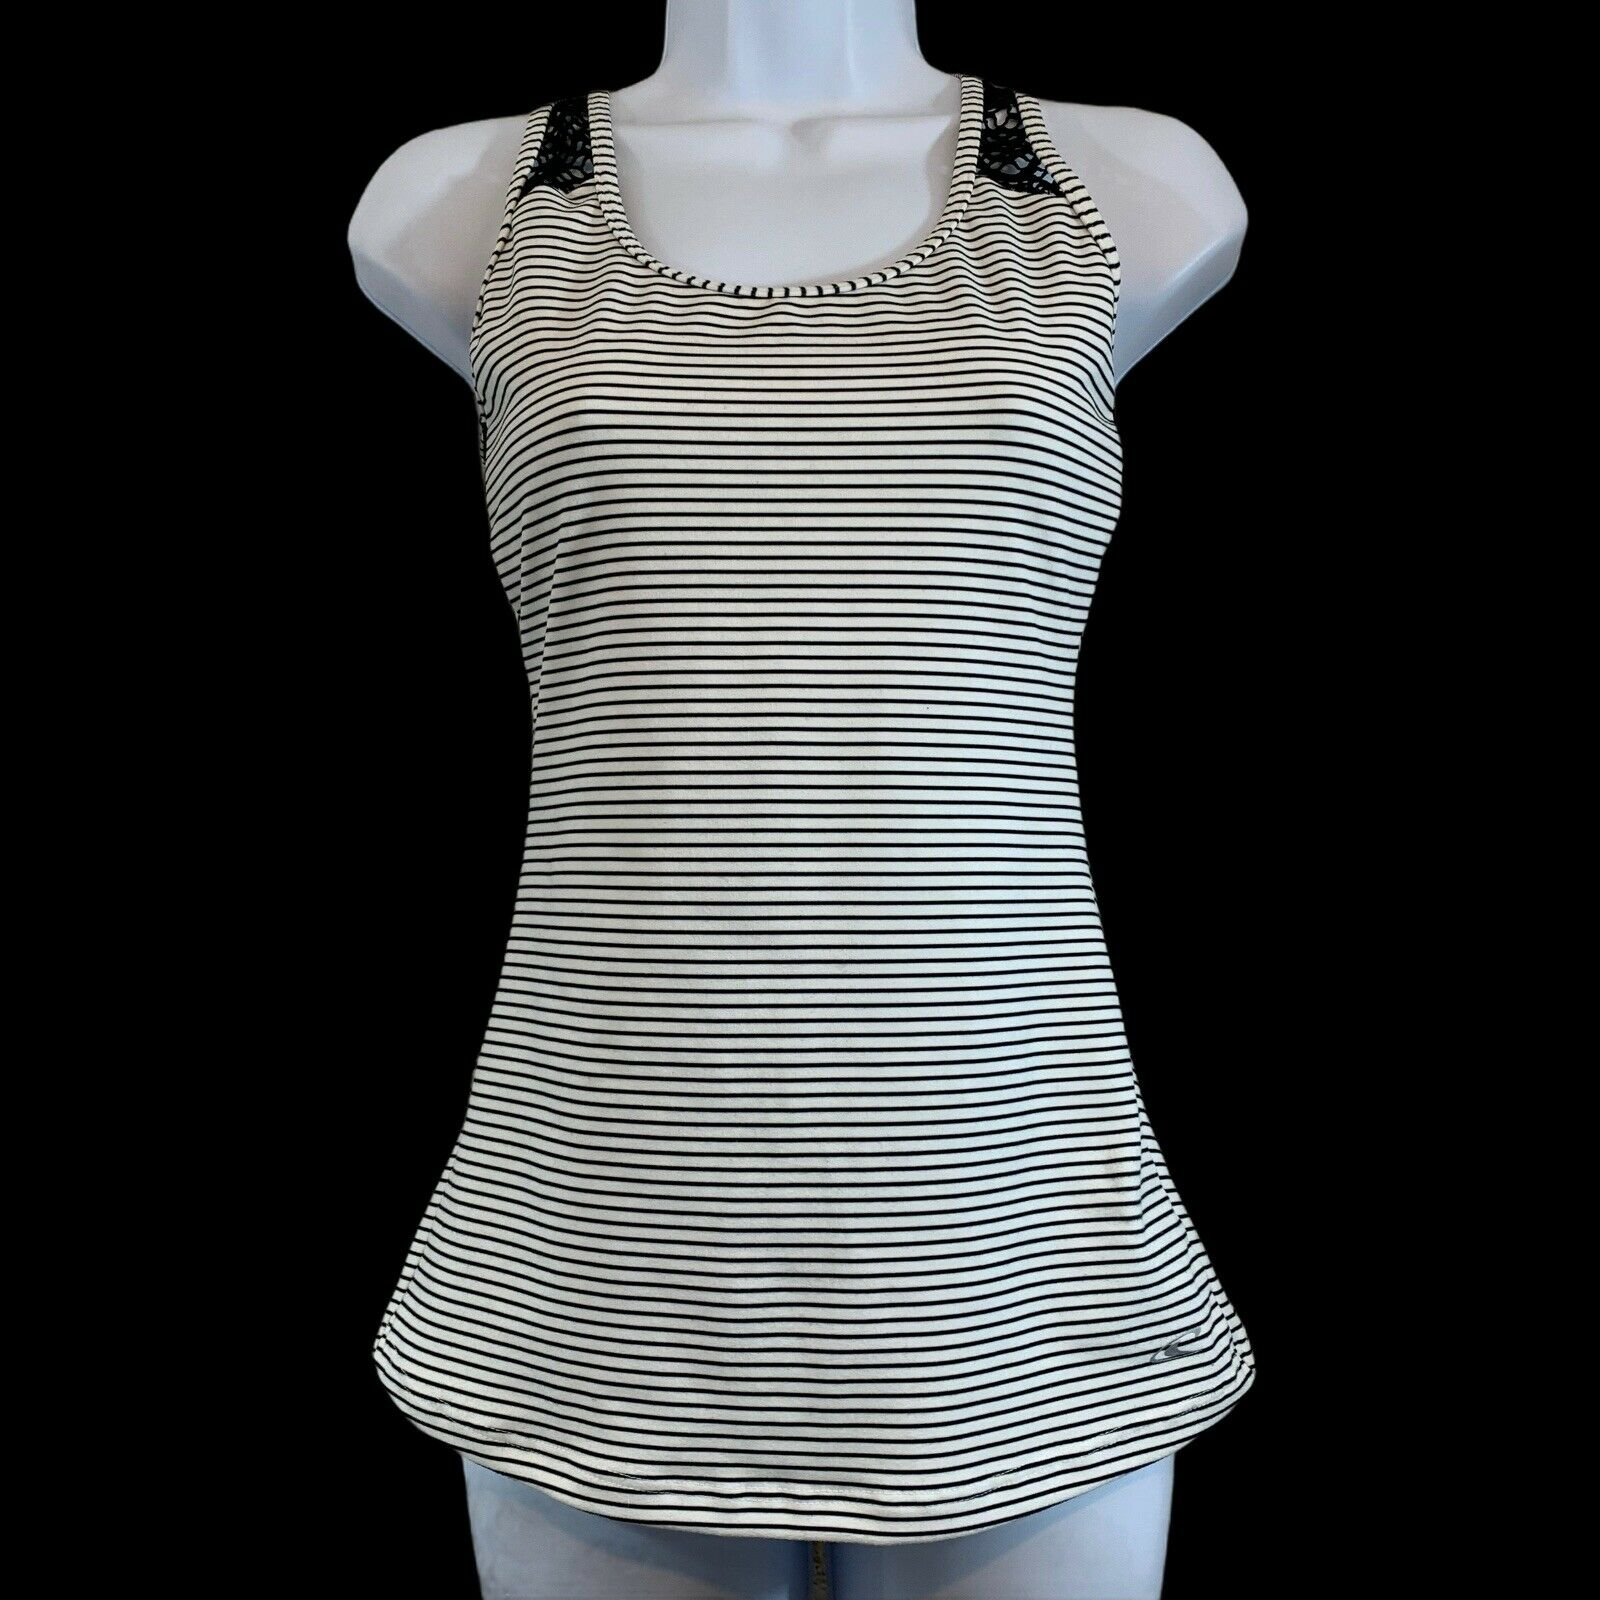 Women's O'Neil 365 Racerback Tank Top Athletic Black & White Crochet Lace Back S